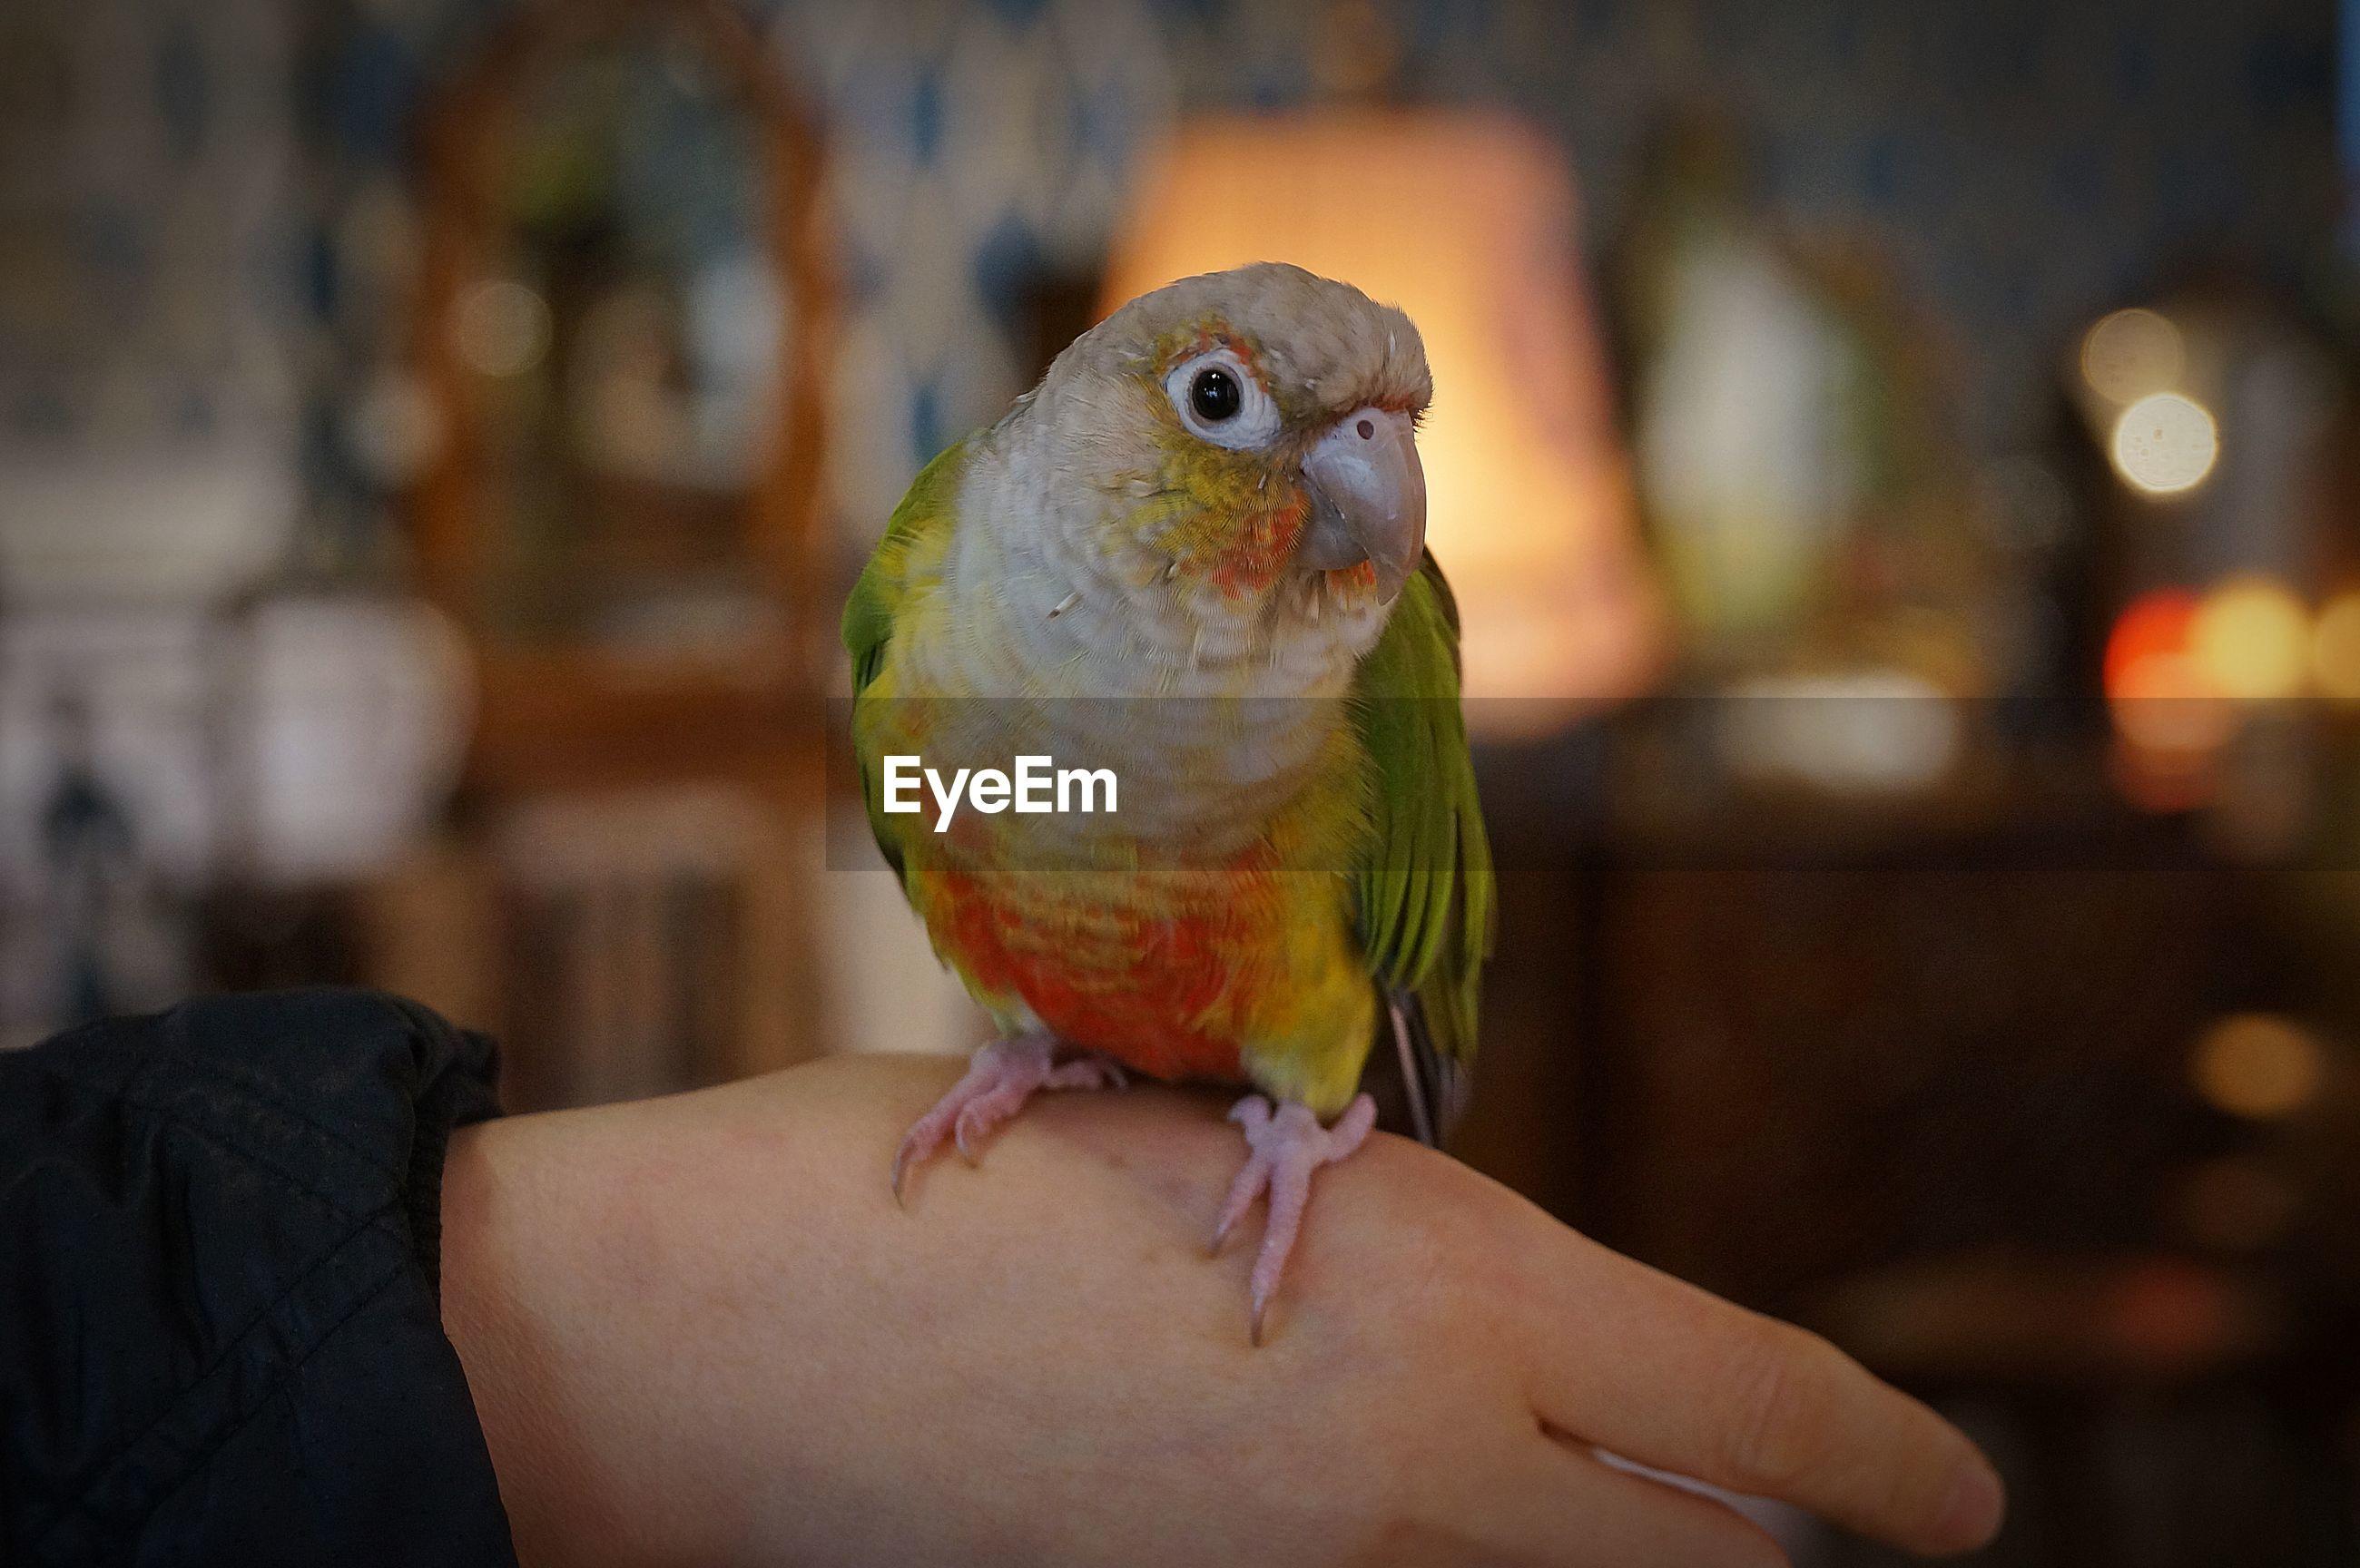 CLOSE-UP OF A HAND HOLDING BIRD